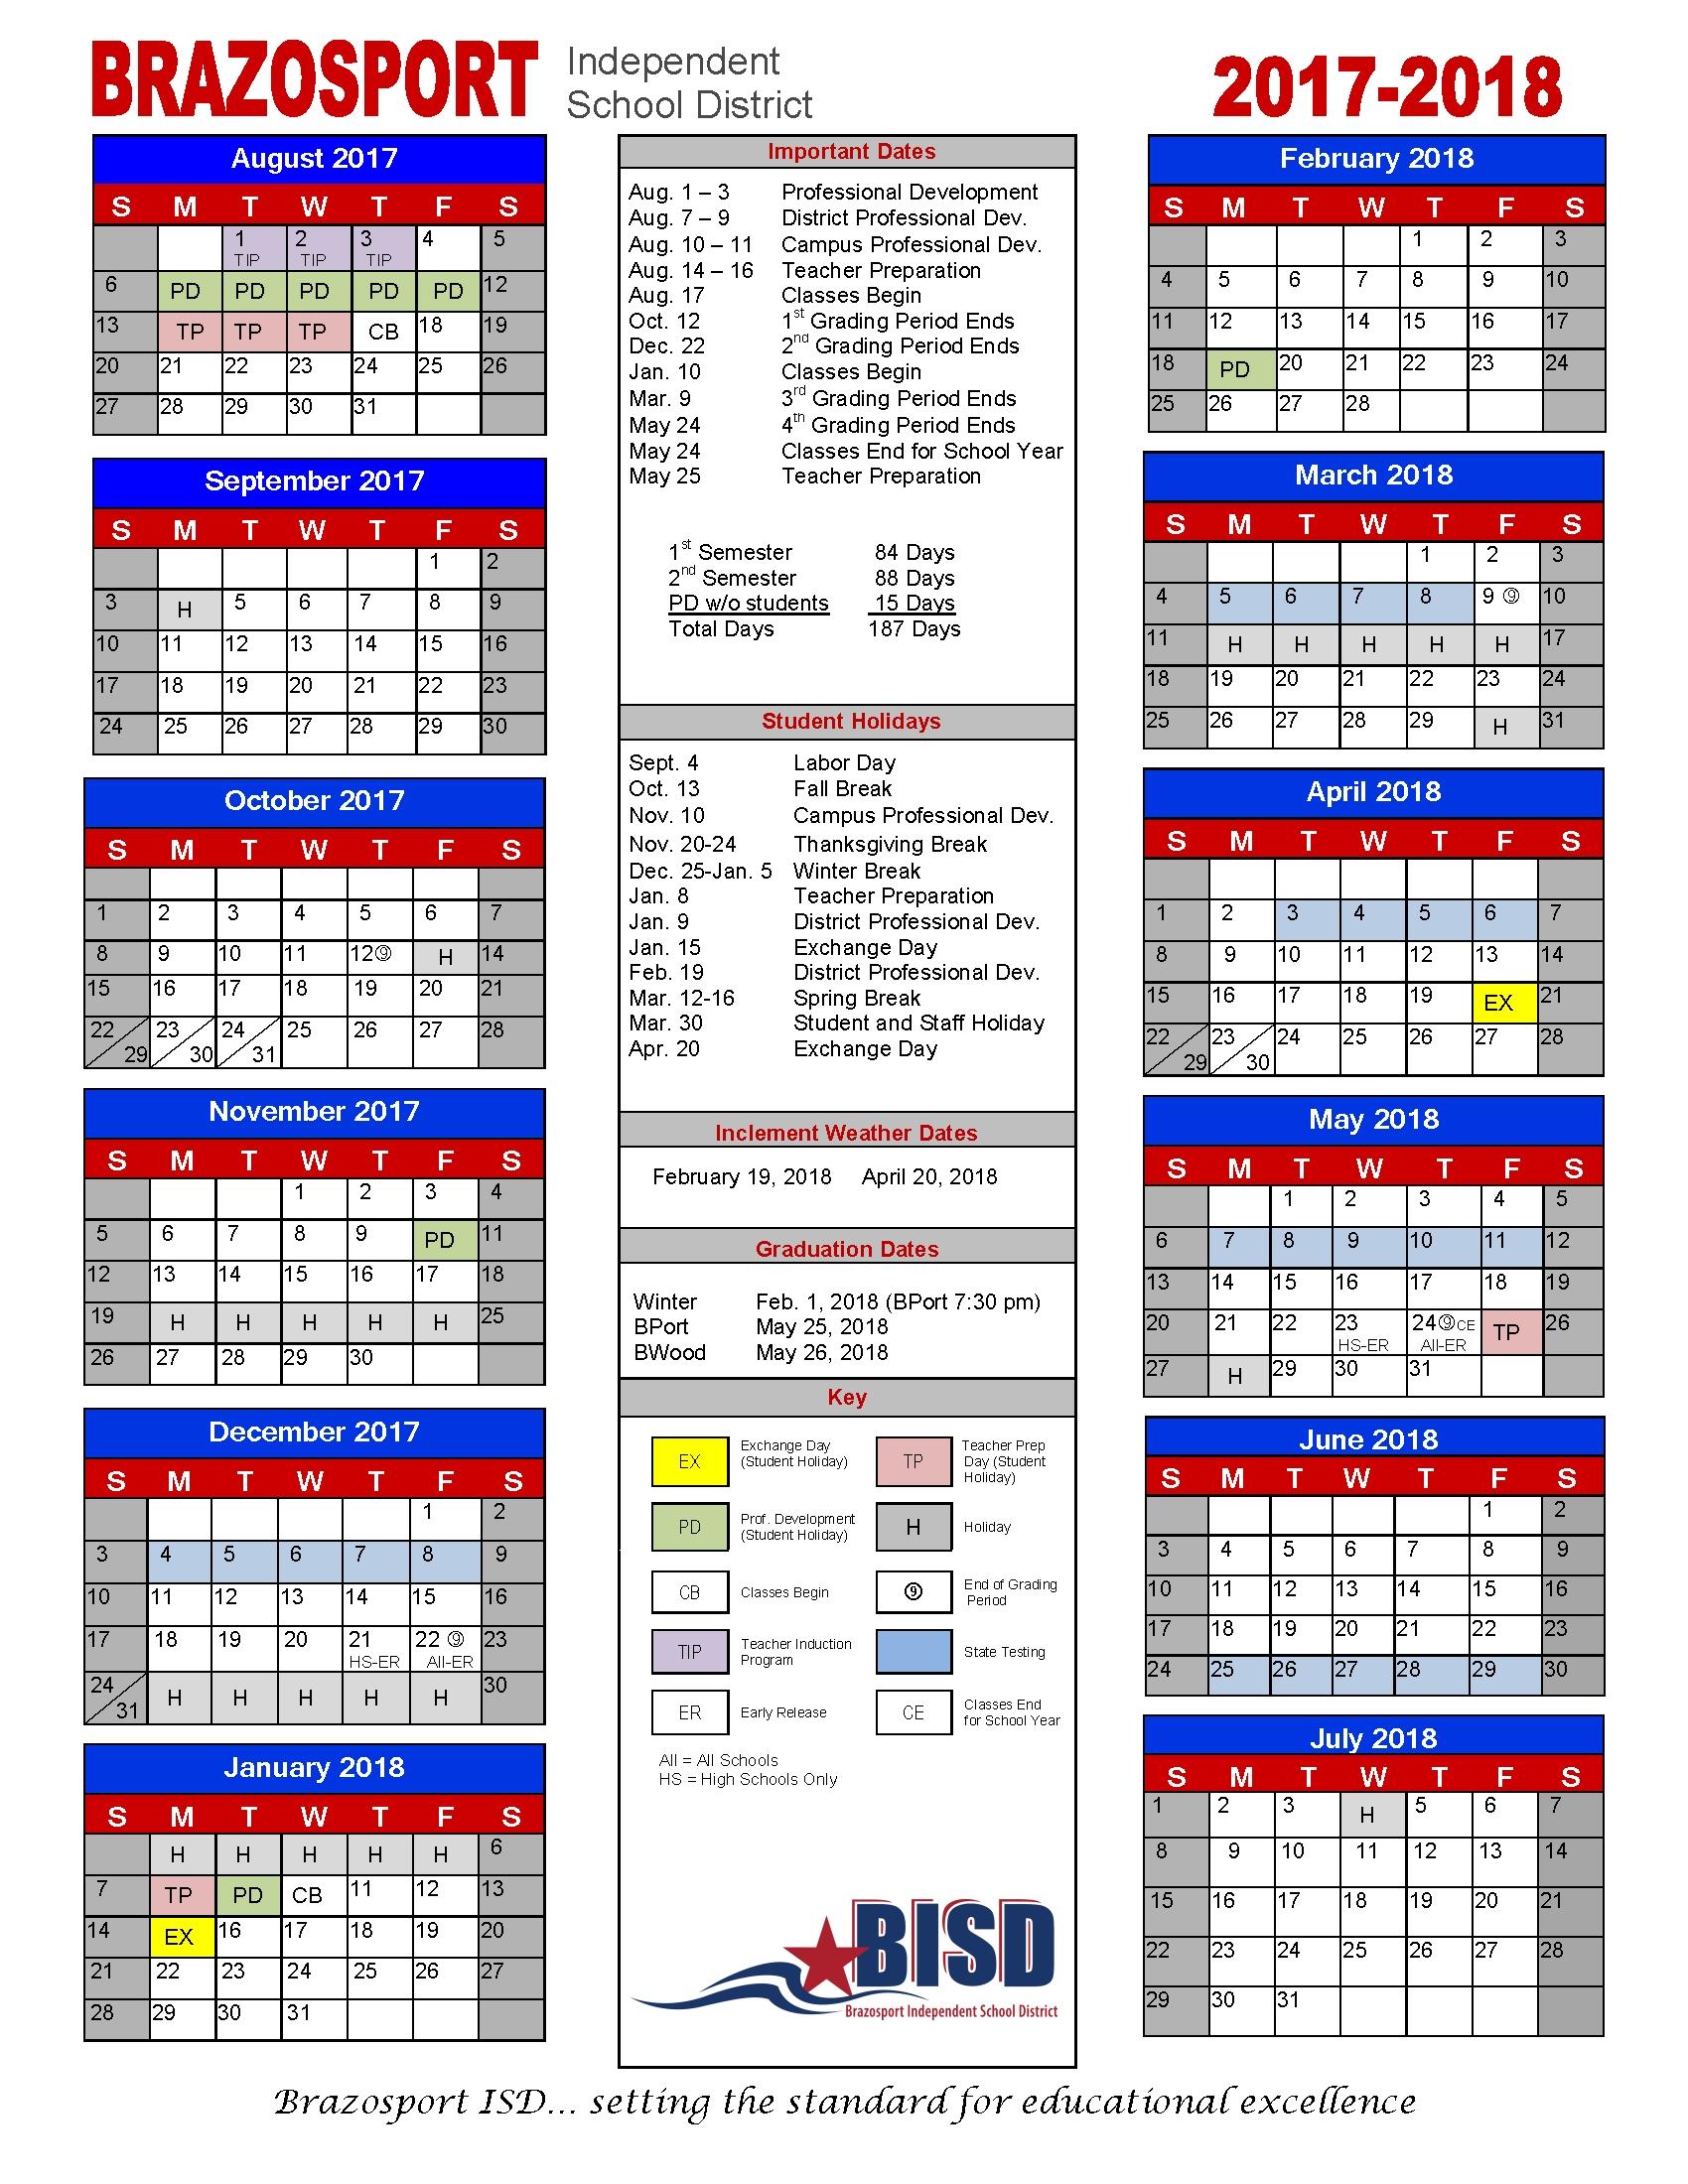 Bisd Board Approves 2017-18 Calendar - Brazosport Independent School Stephen F Austin Calendar 2019